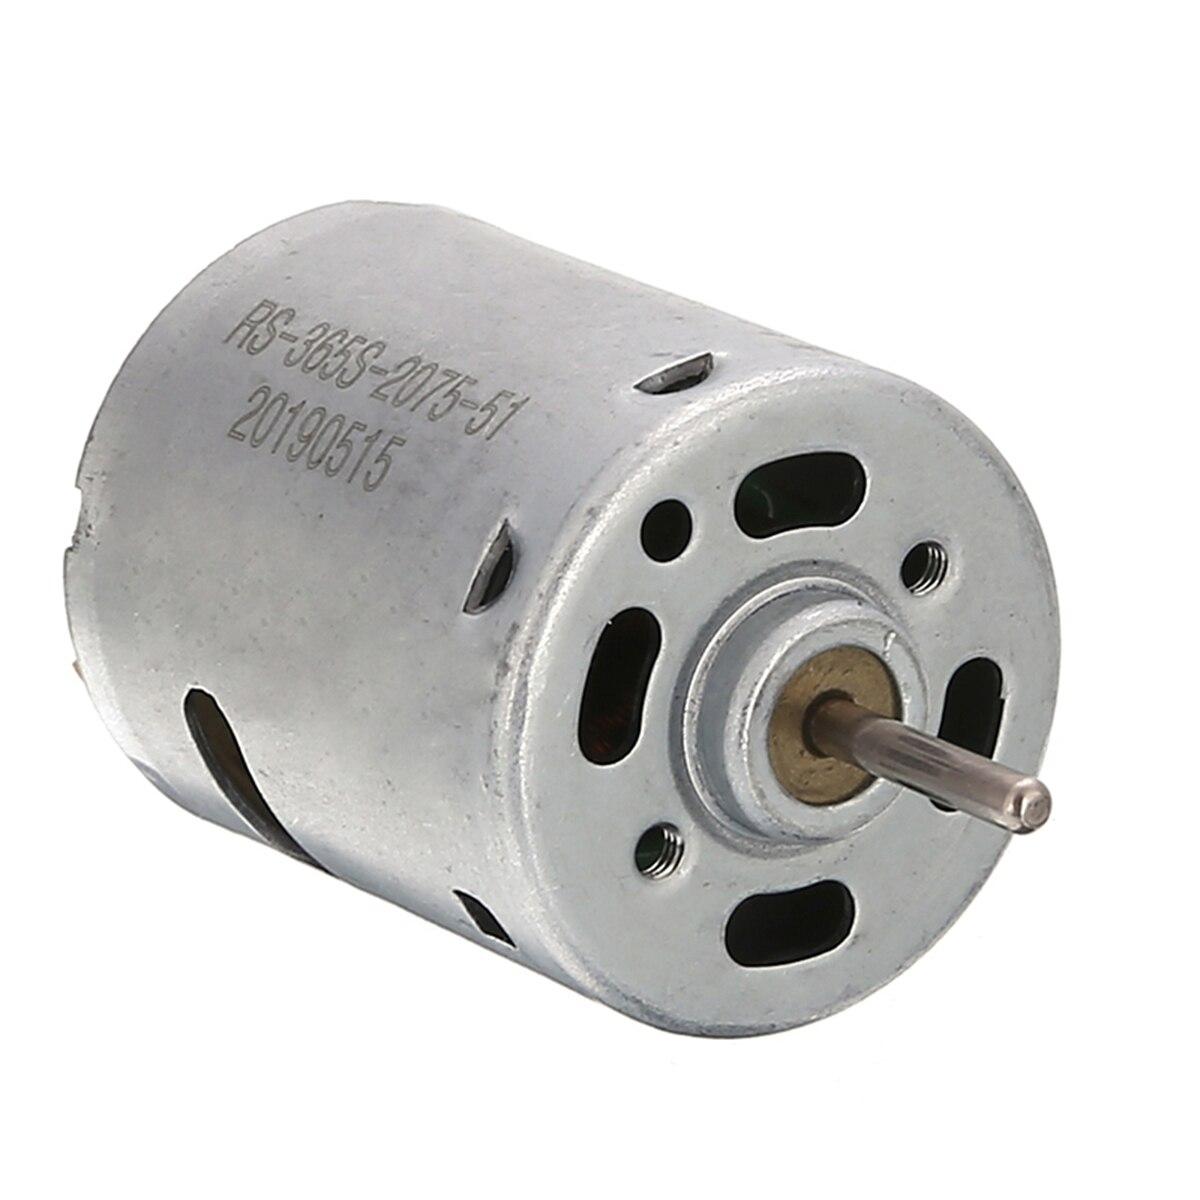 6-12V 5000RPM Mini DC Motor Double Ball Bearings Diameter 27.5mm For DIY Small Electric Drill Motor